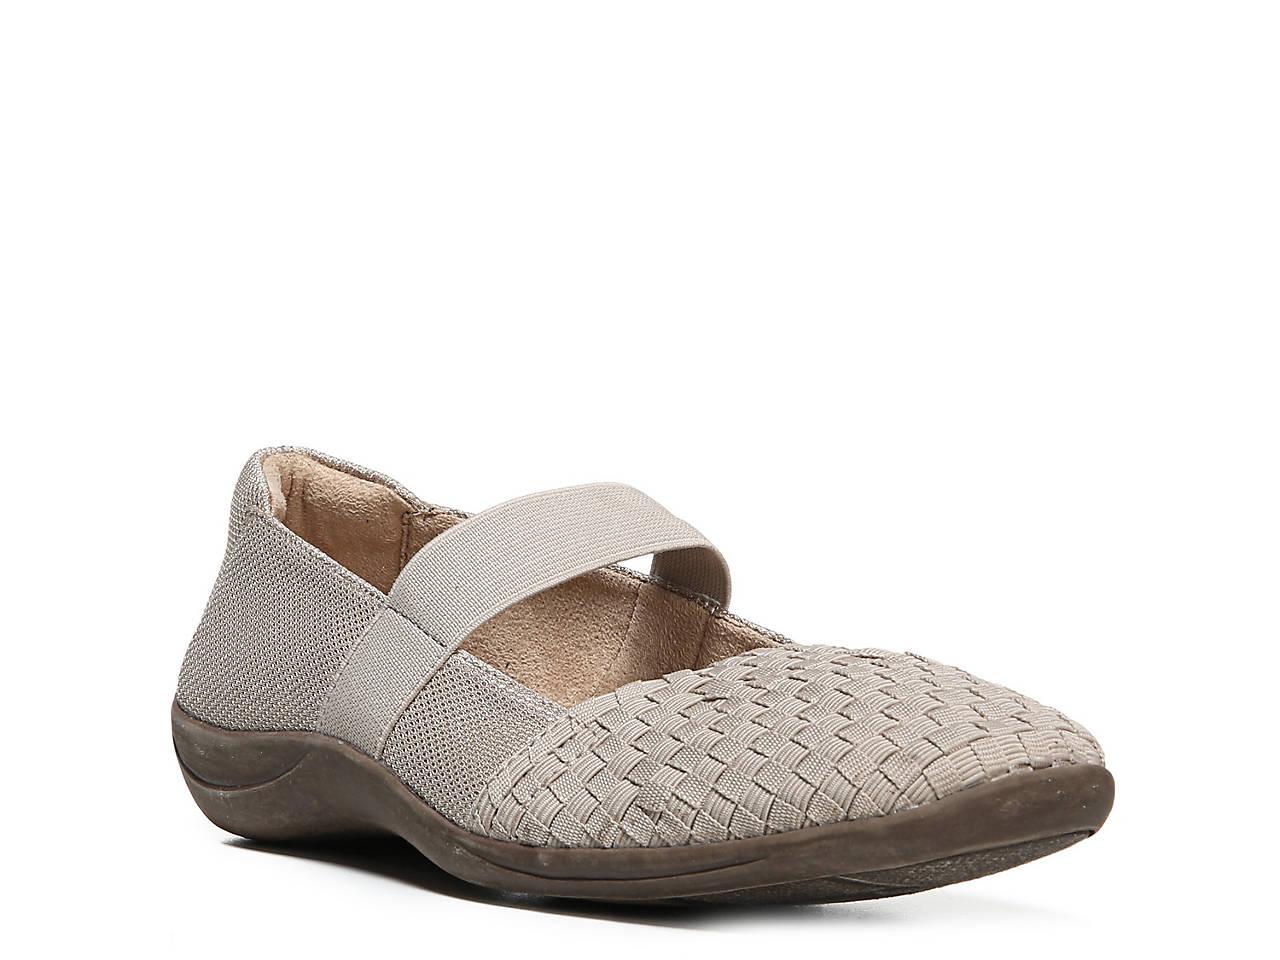 04759982f6 Naturalizer Fearn Flat Women s Shoes